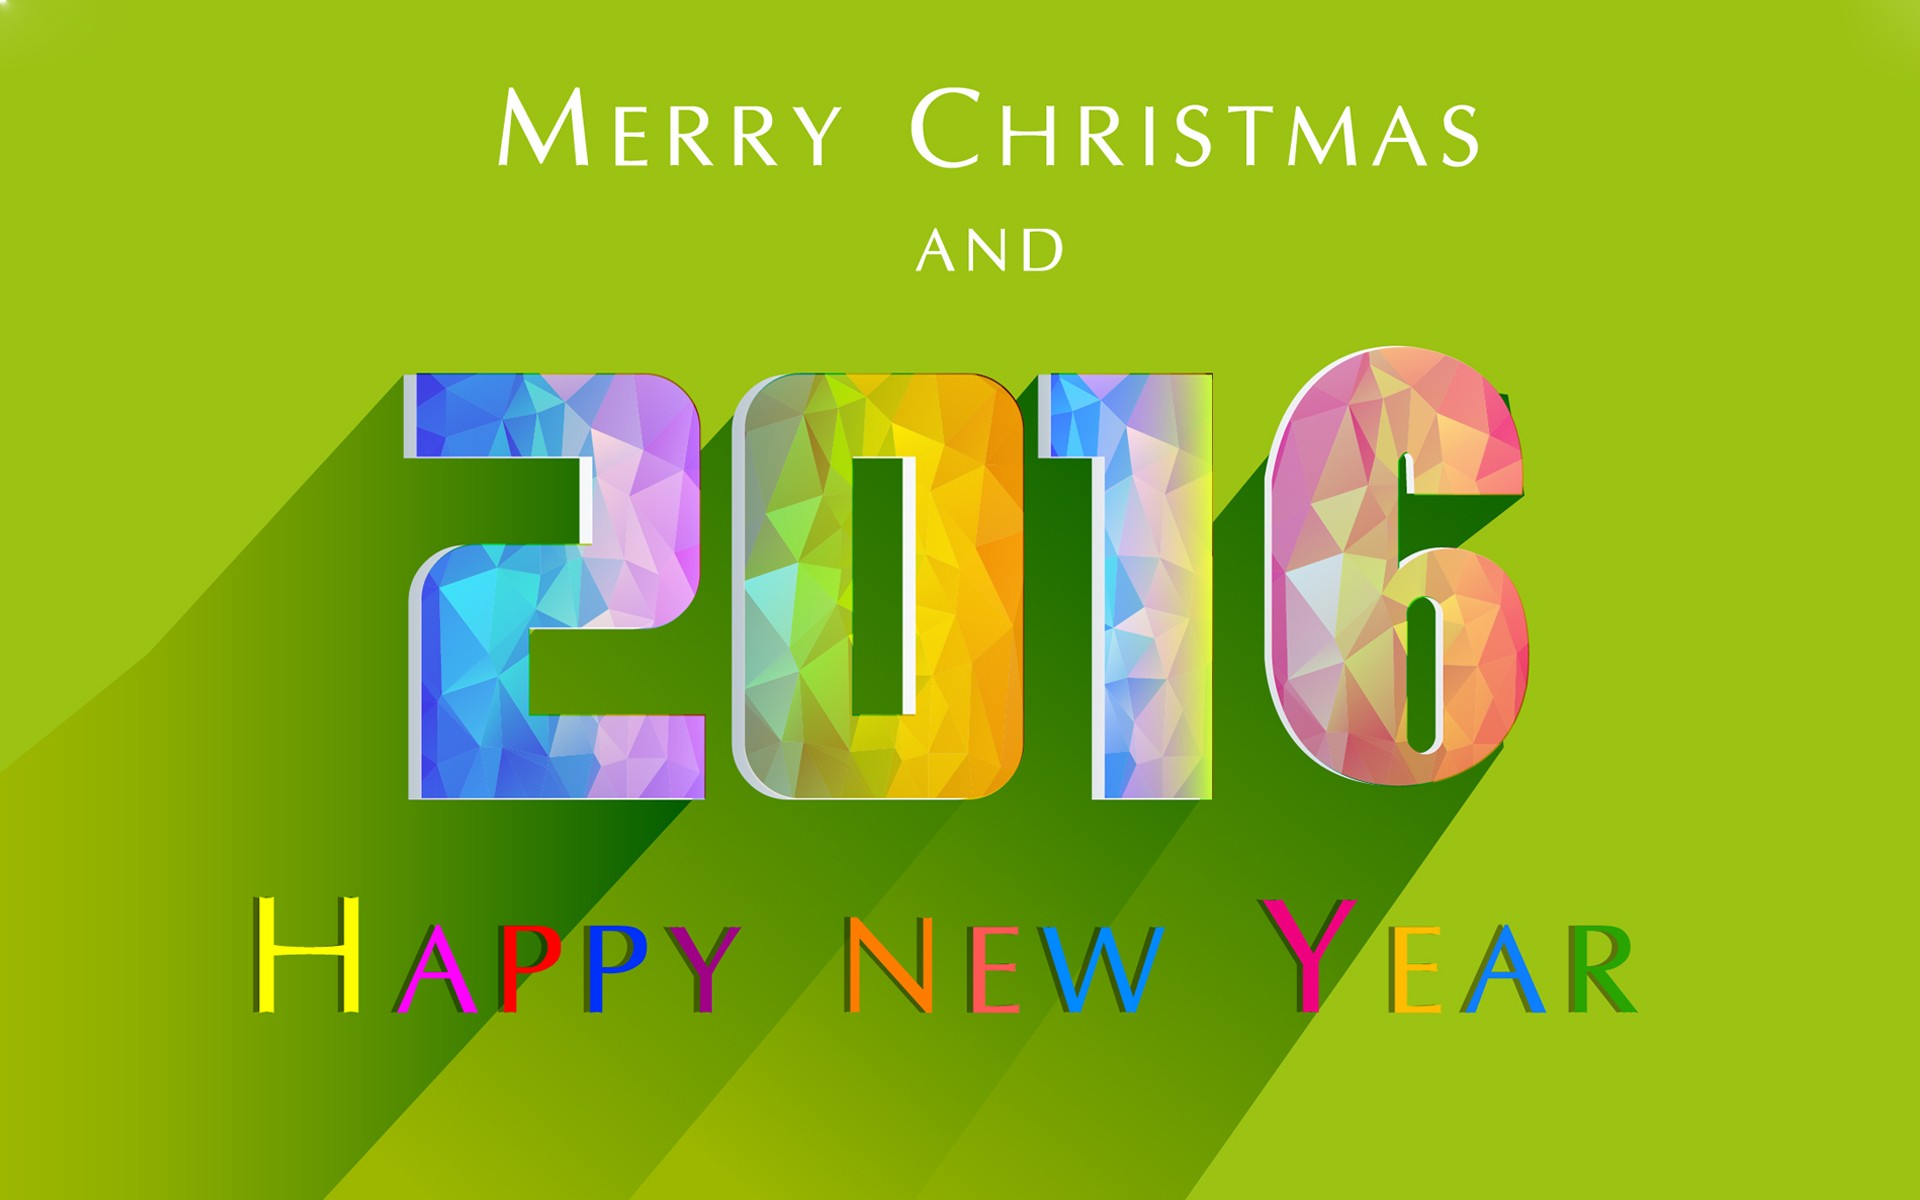 Happy New Year 2016 HD Wallpaper   New HD Wallpapers 1920x1200